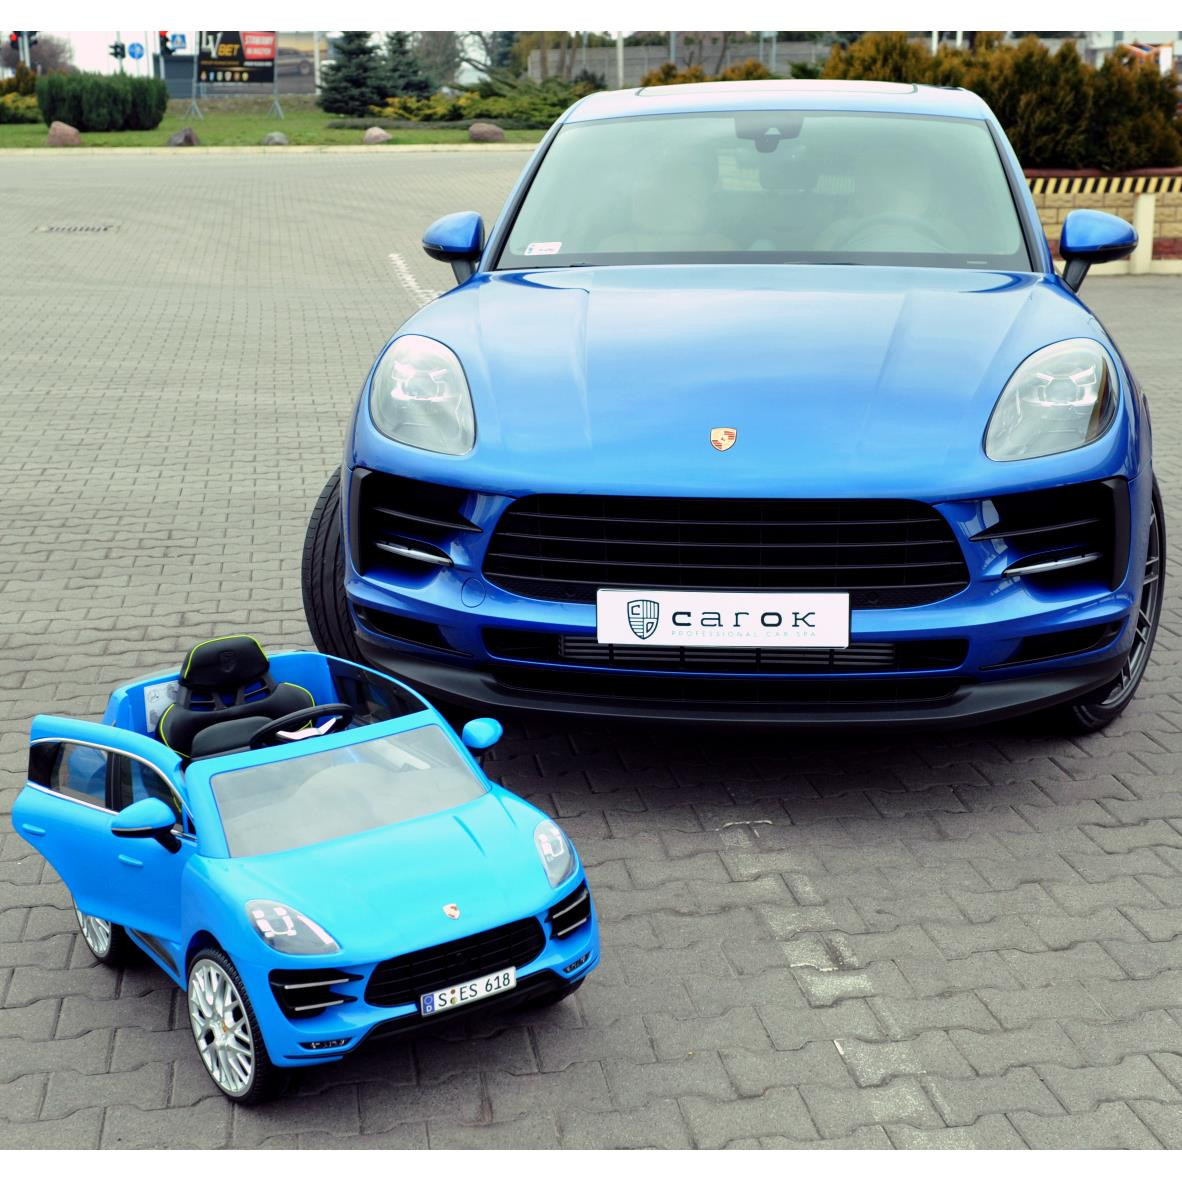 Rollplay. Premium e-cars